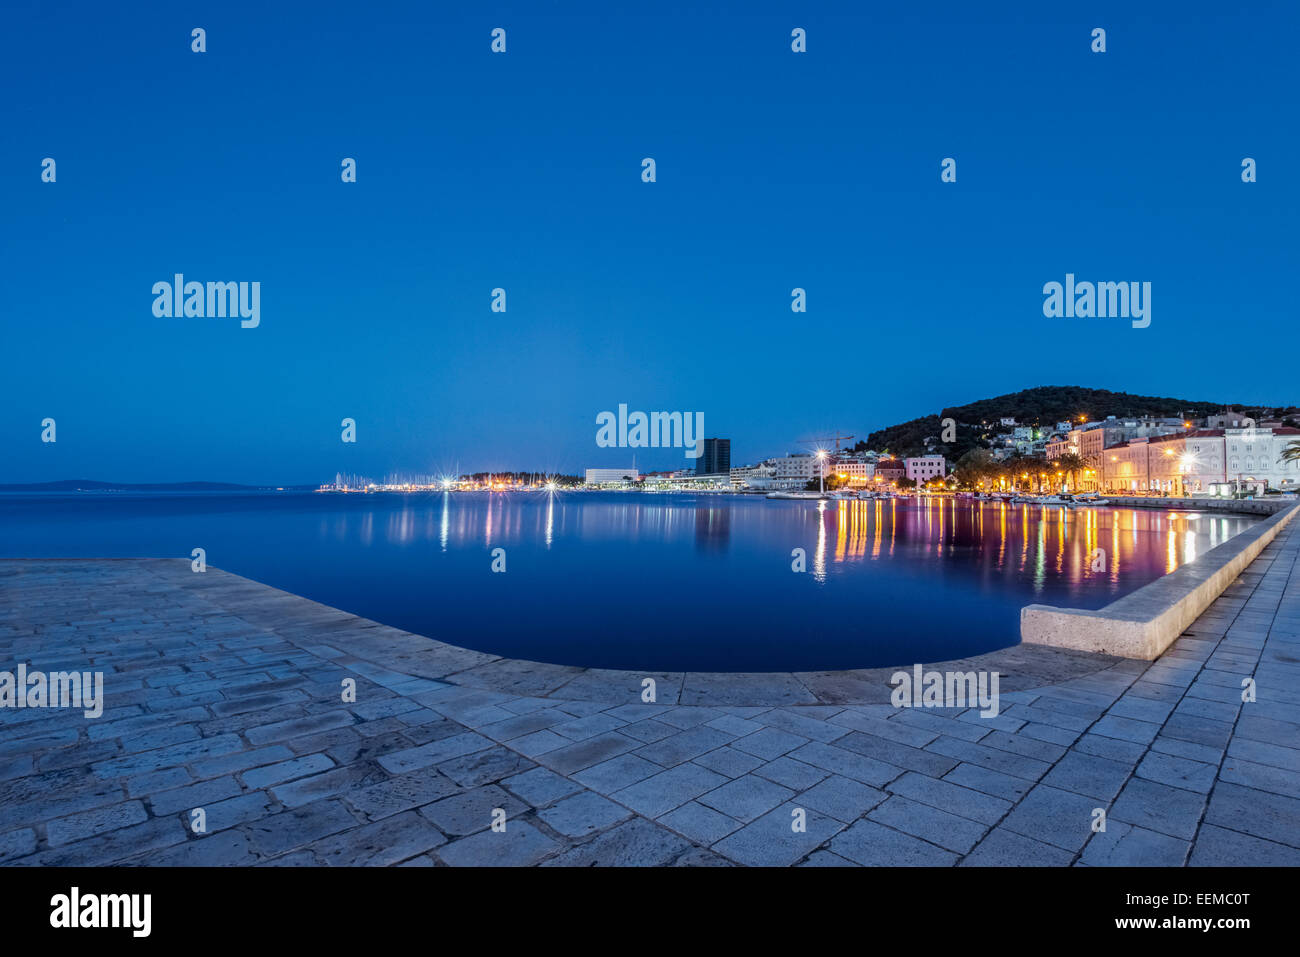 Waterfront sidewalk, illuminated boats and dock at dusk, Split, Split, Croatia - Stock Image